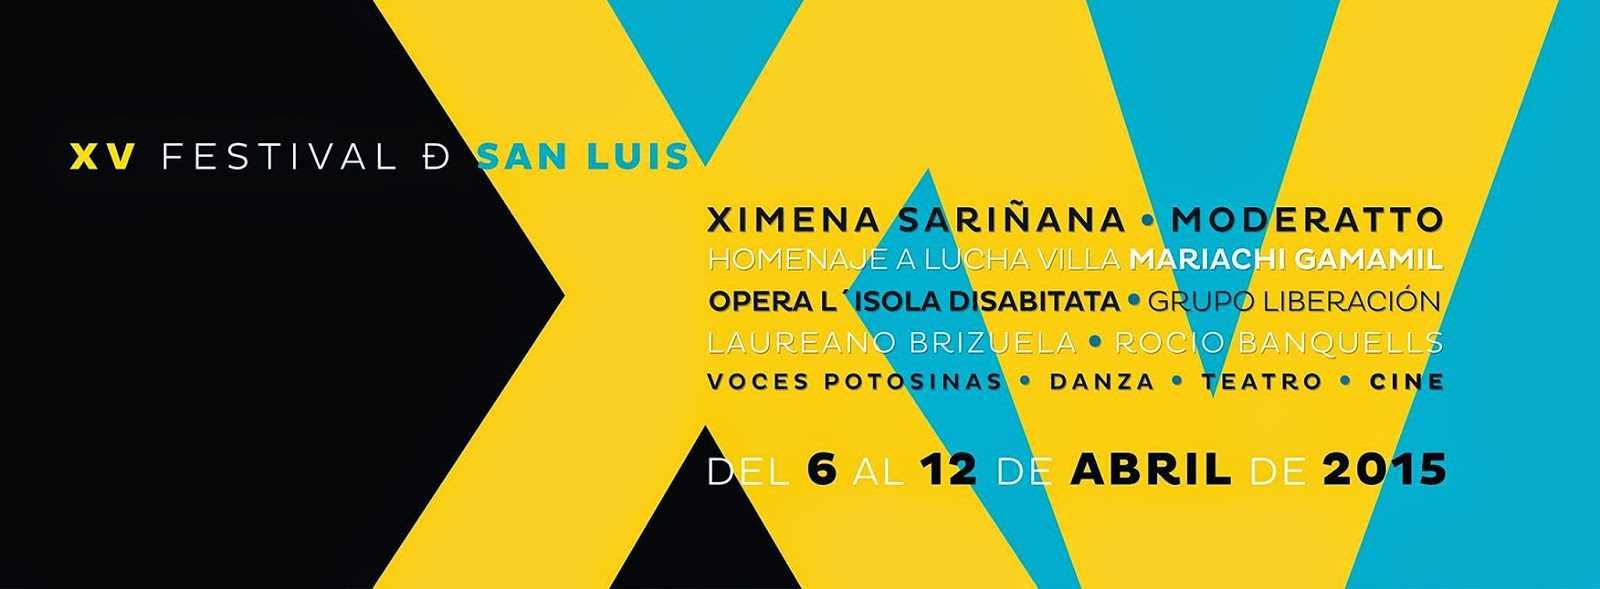 xv Festival de San Luis 2015